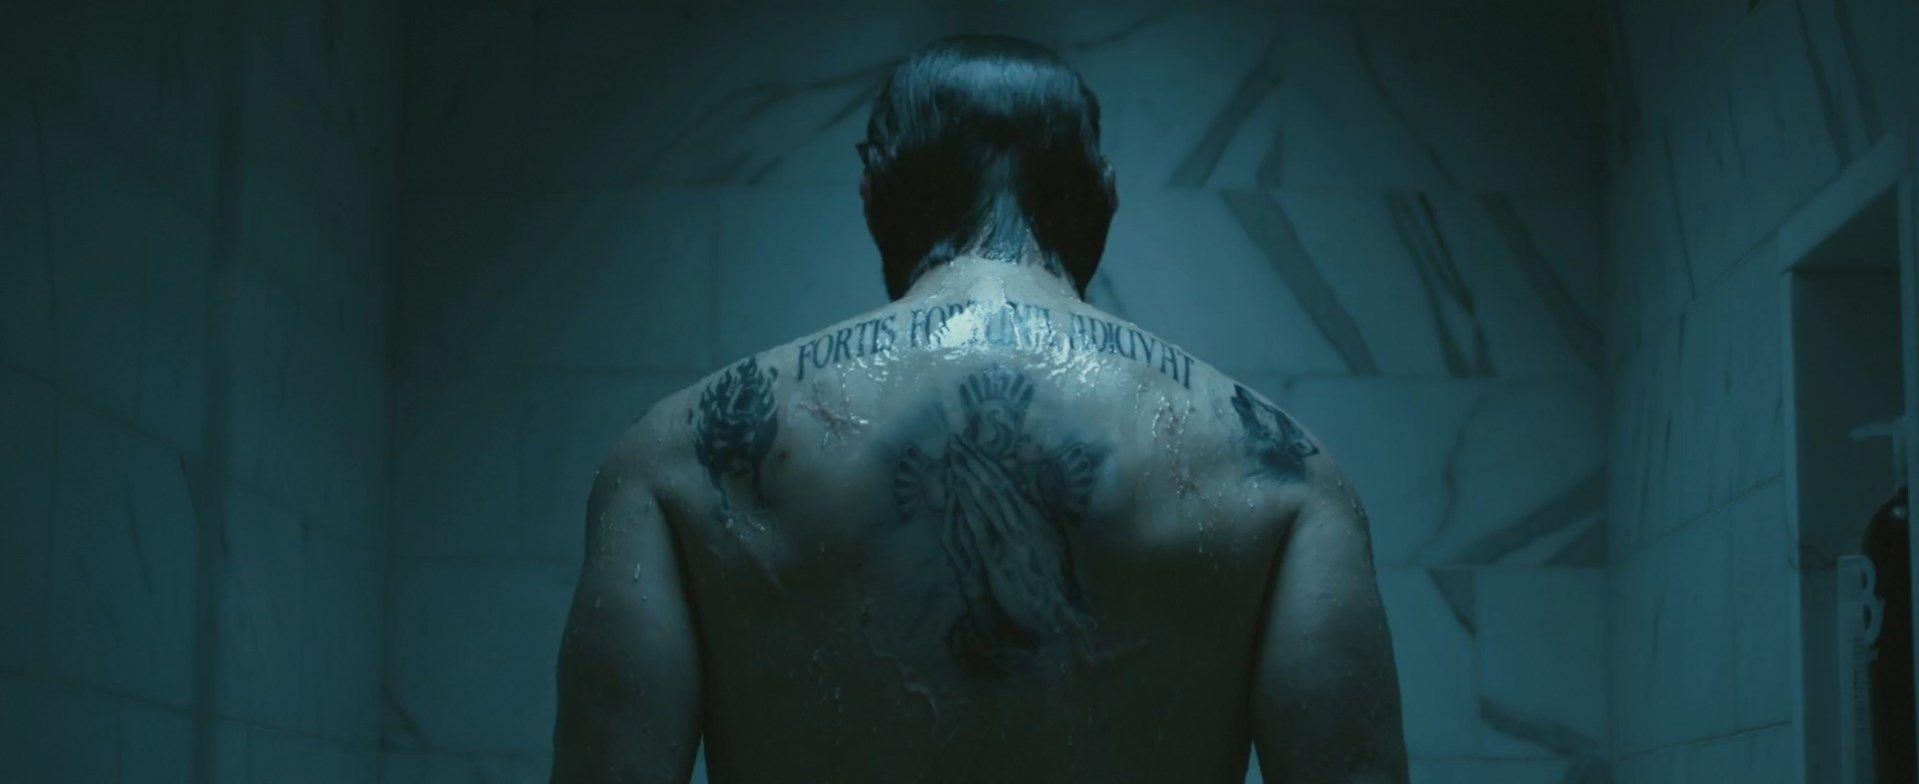 Image for Keanu Reeves John Wick (2014) wallpaper Keanu